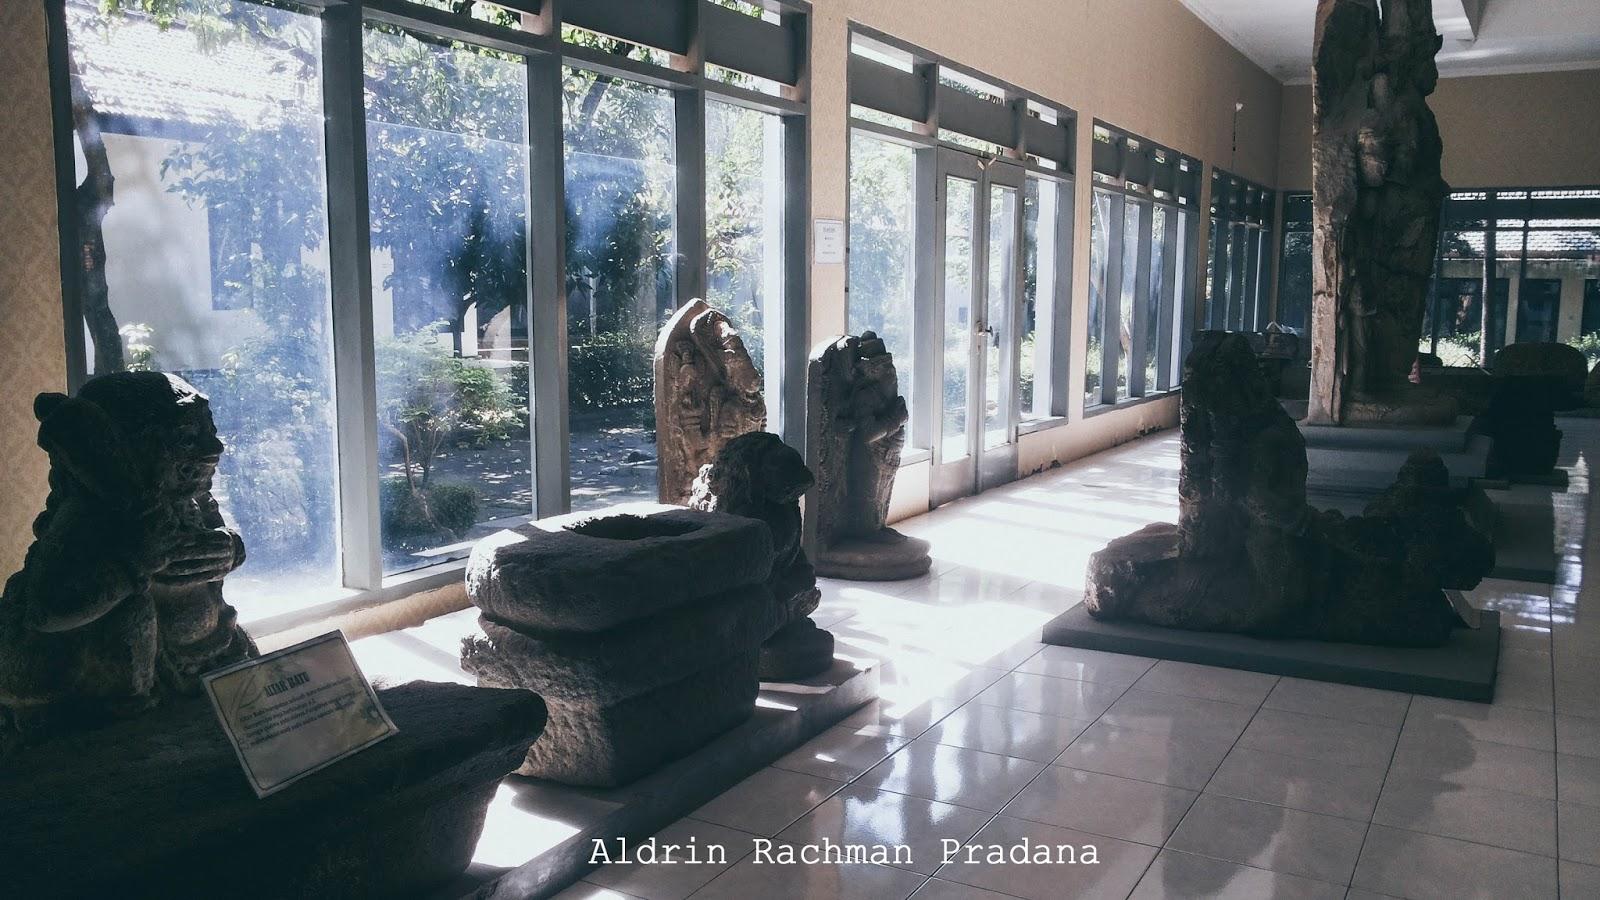 Berwisata Melihat Koleksi Museum Airlangga Kediri Aldrin Rachman Terdapat Altar